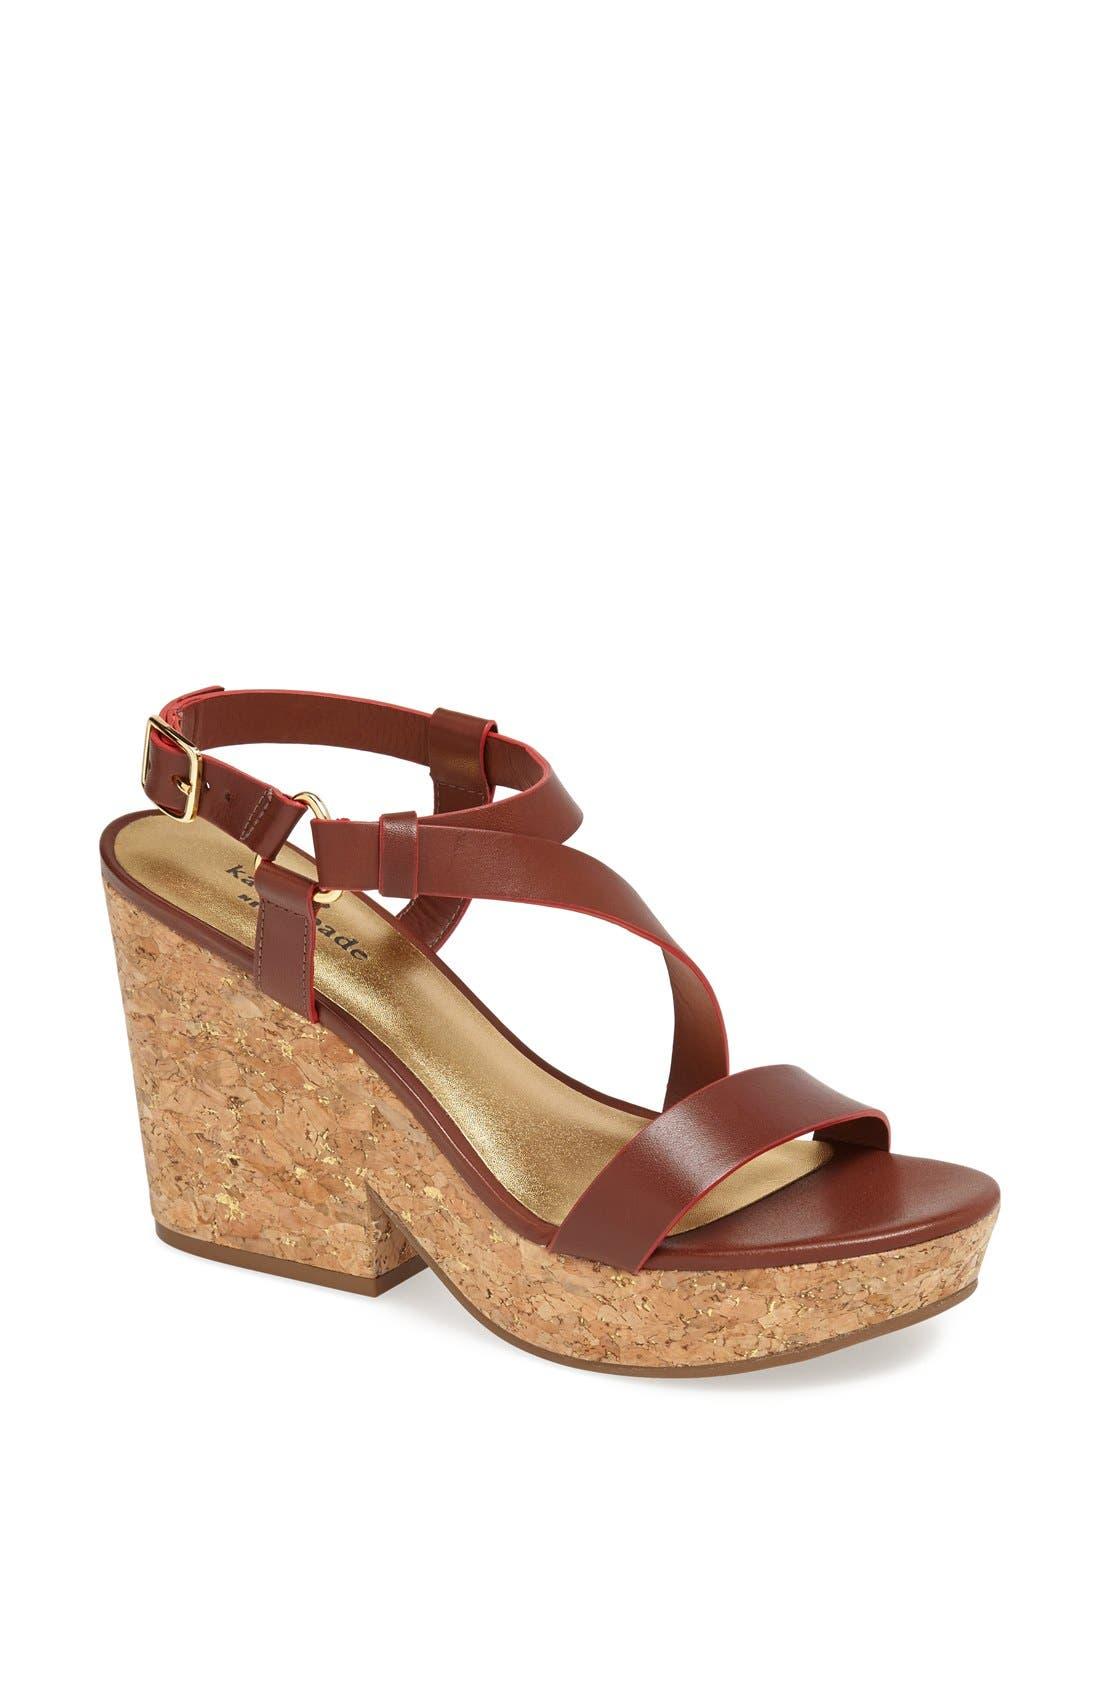 Alternate Image 1 Selected - kate spade new york 'viex' wedge sandal